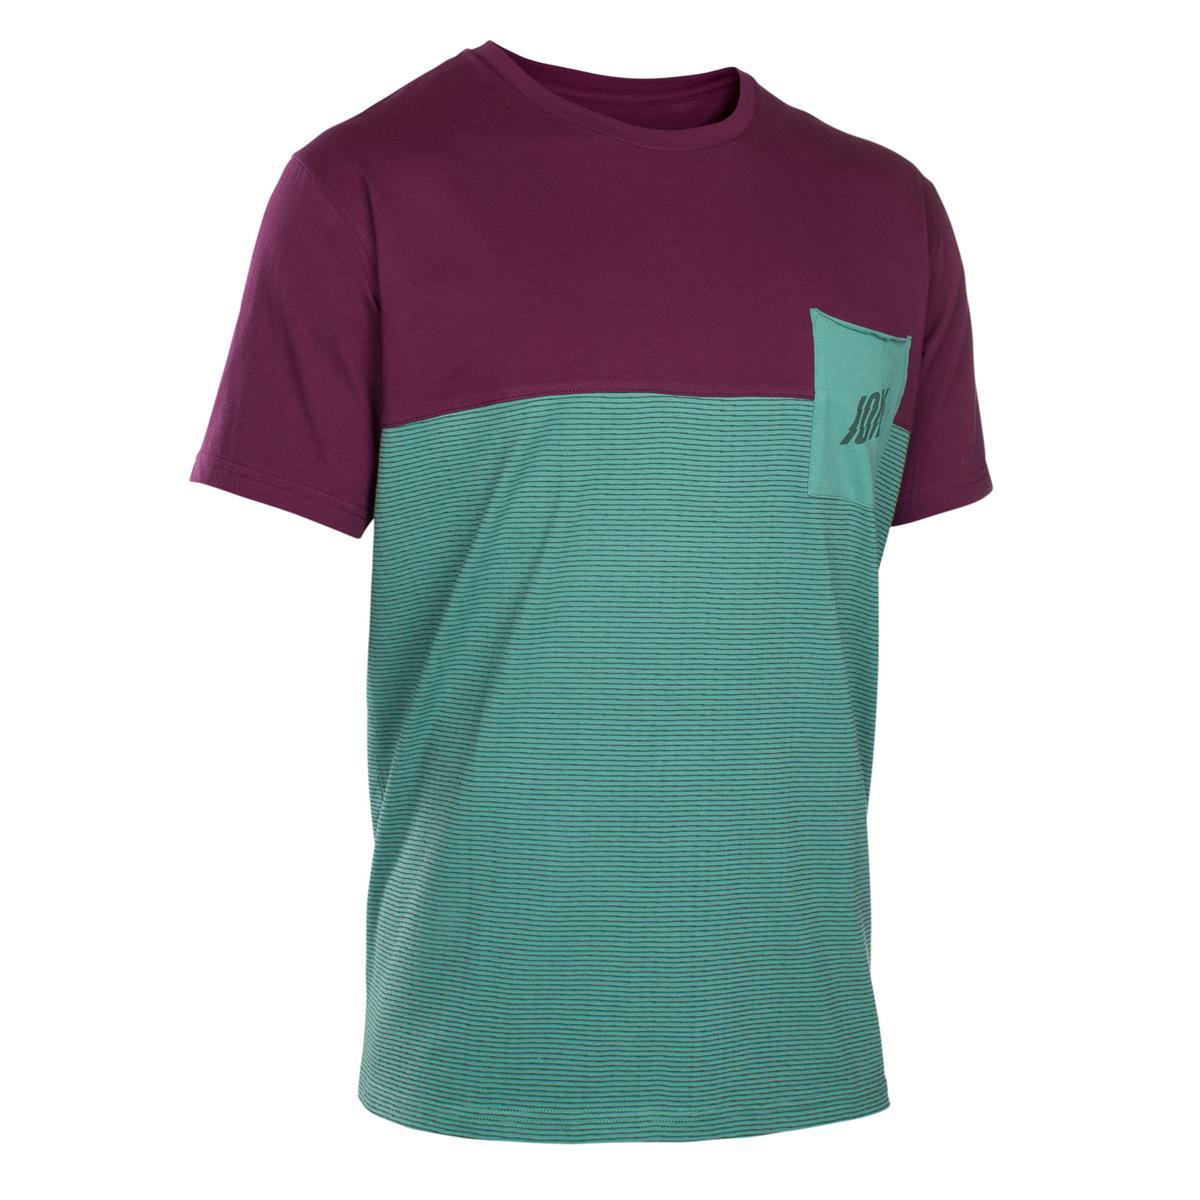 ION T-Shirt Cloudbreak Sea Green